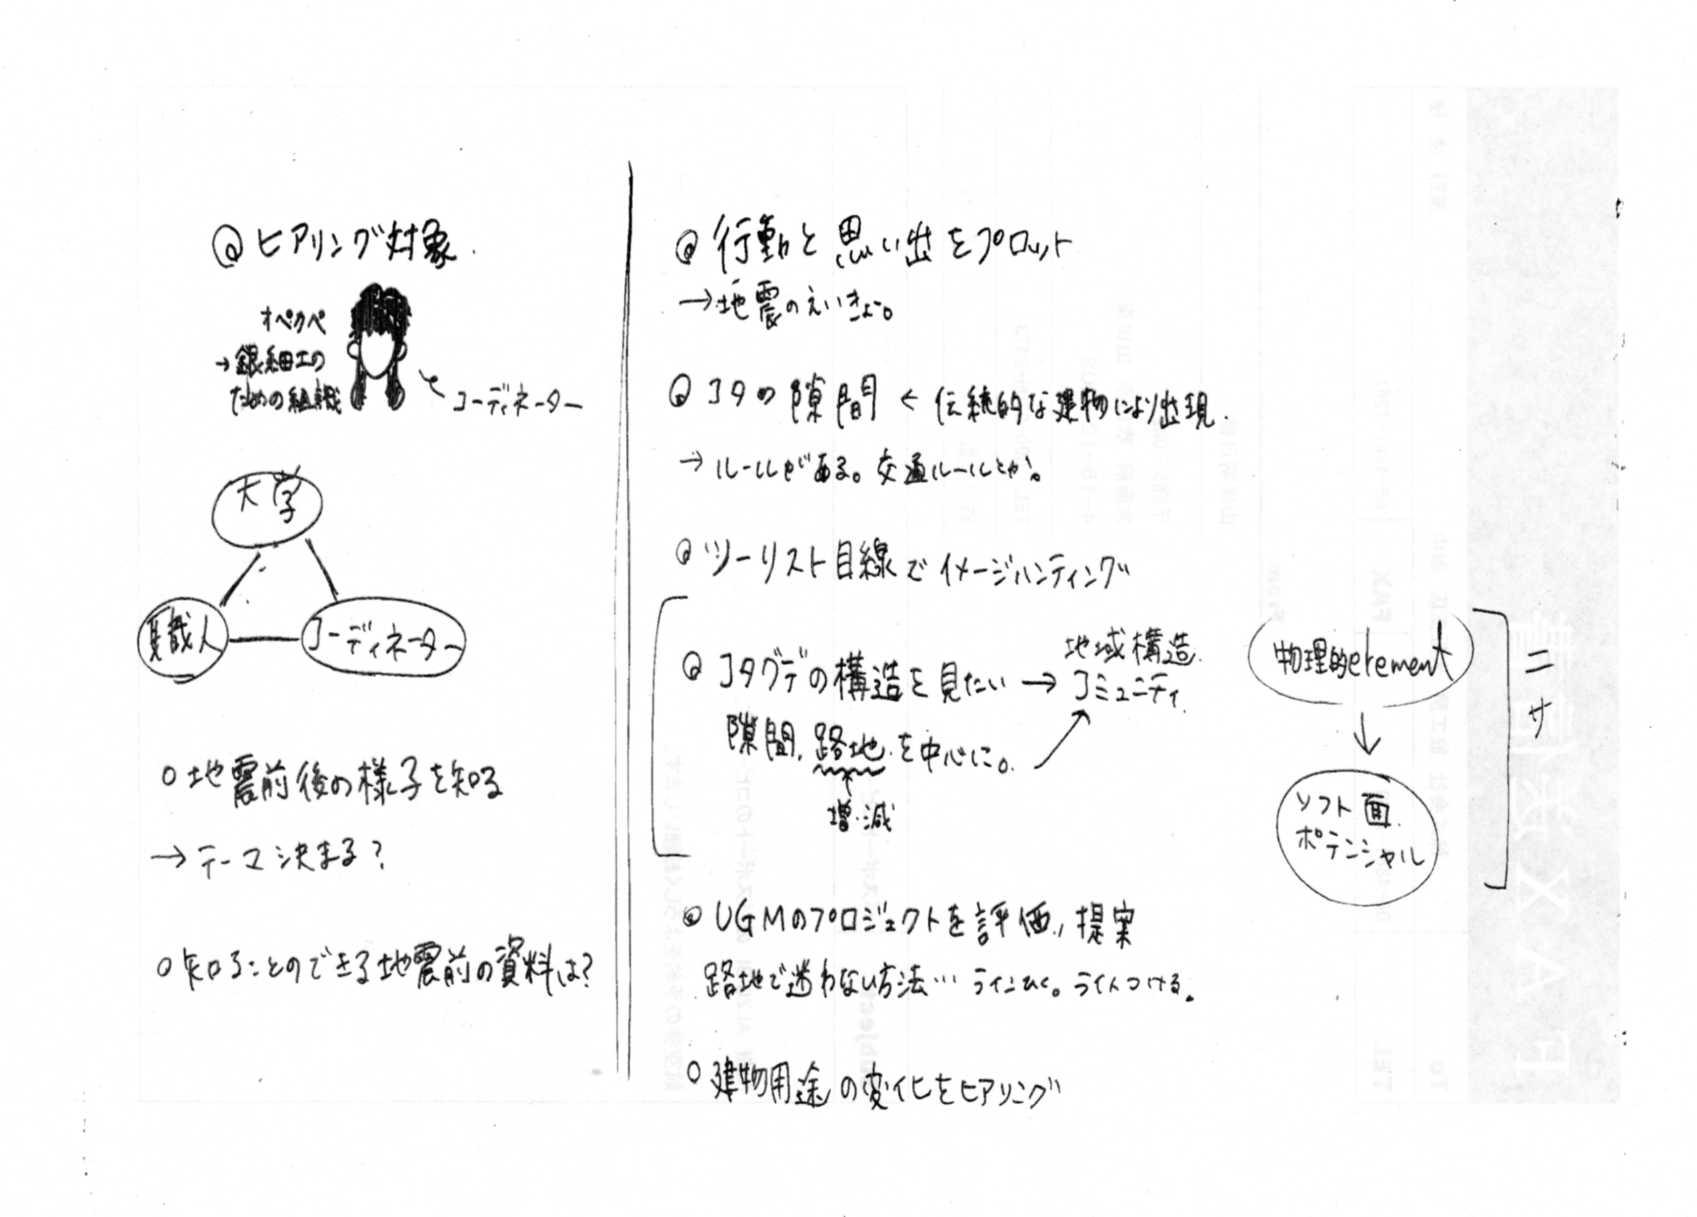 Similar to (page 1) - Japanese...